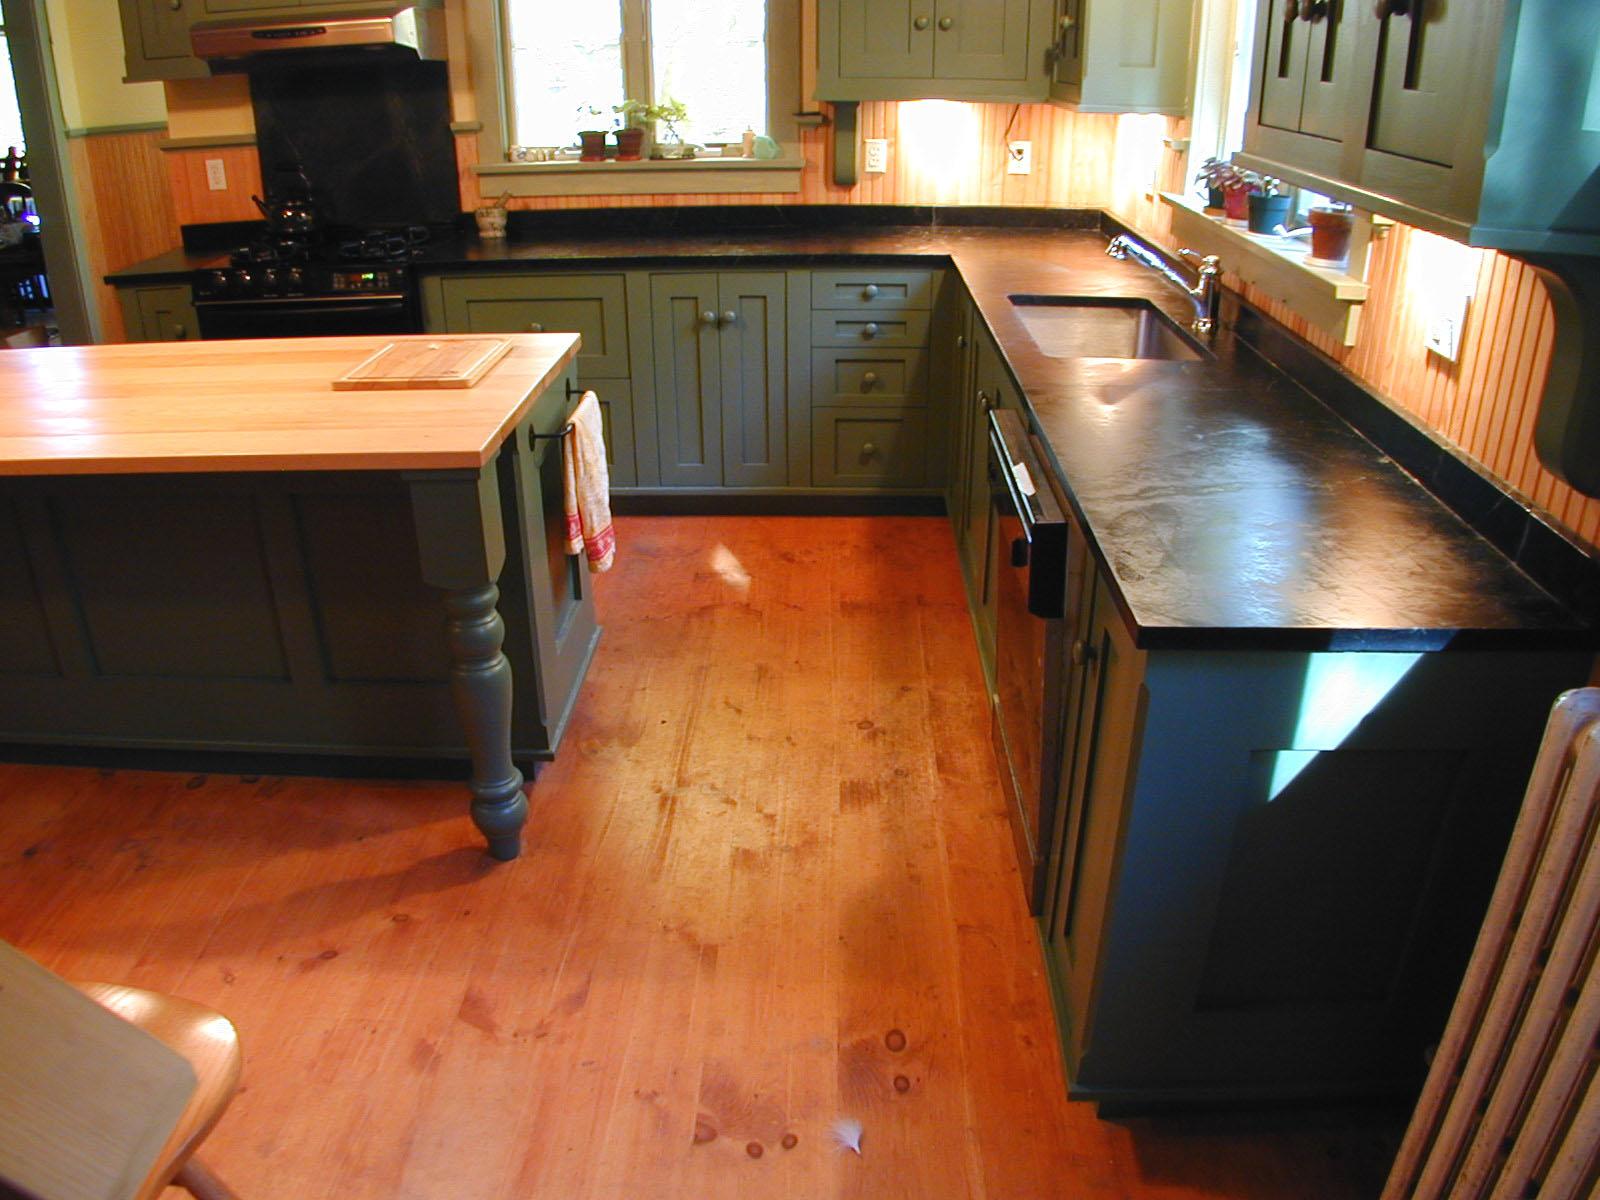 Farm Kitchen Island Pshop 1024x768 Historic Kitchen Farm Kitchen Cabinets  Pshp 1024x768 Historic Kitchen